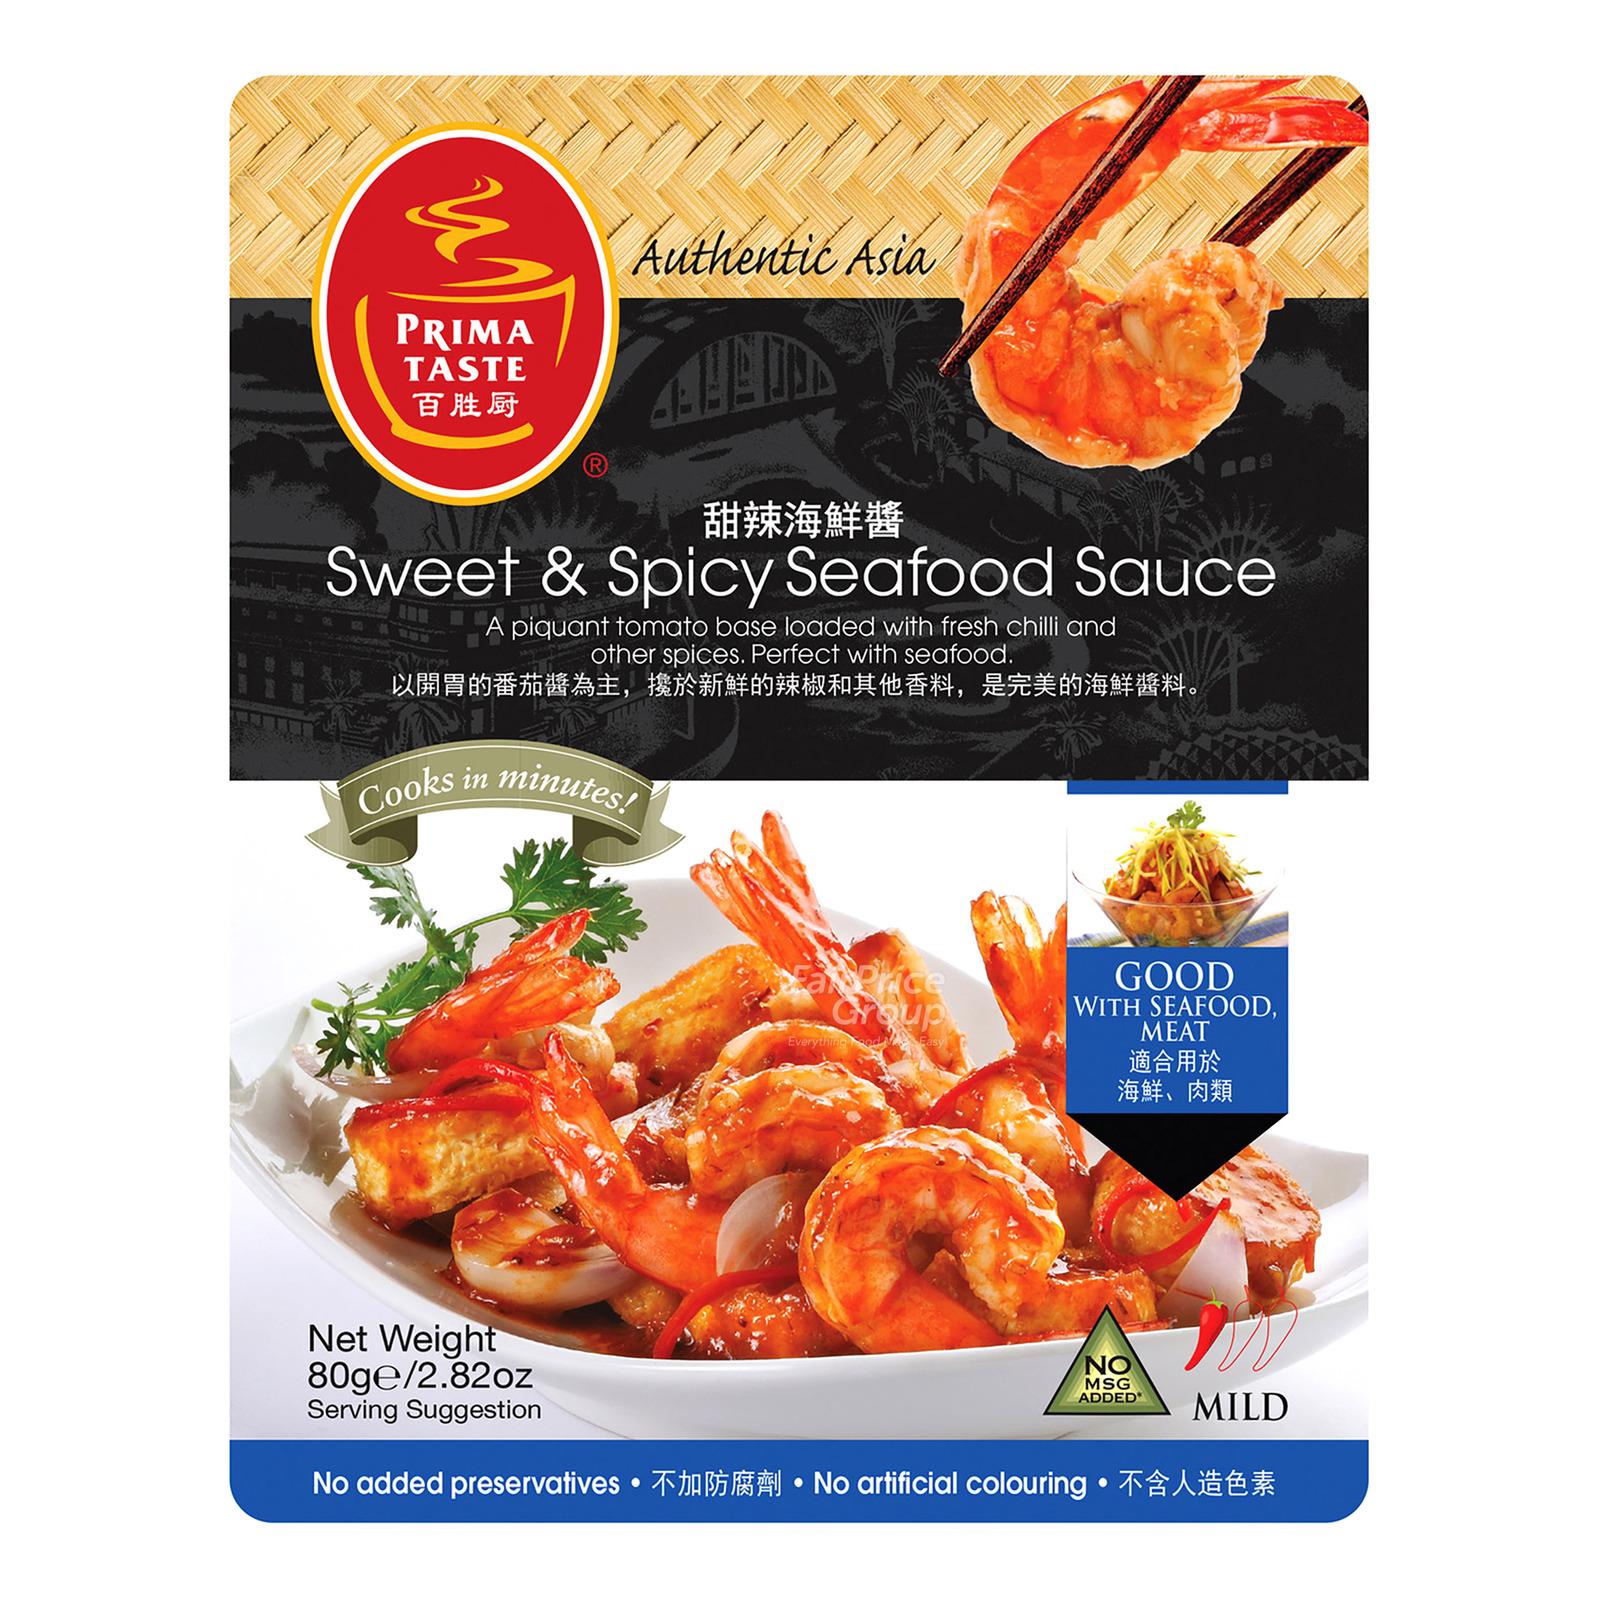 PRIMA TASTE Sweet & Spicy Seafood Sauce 80g